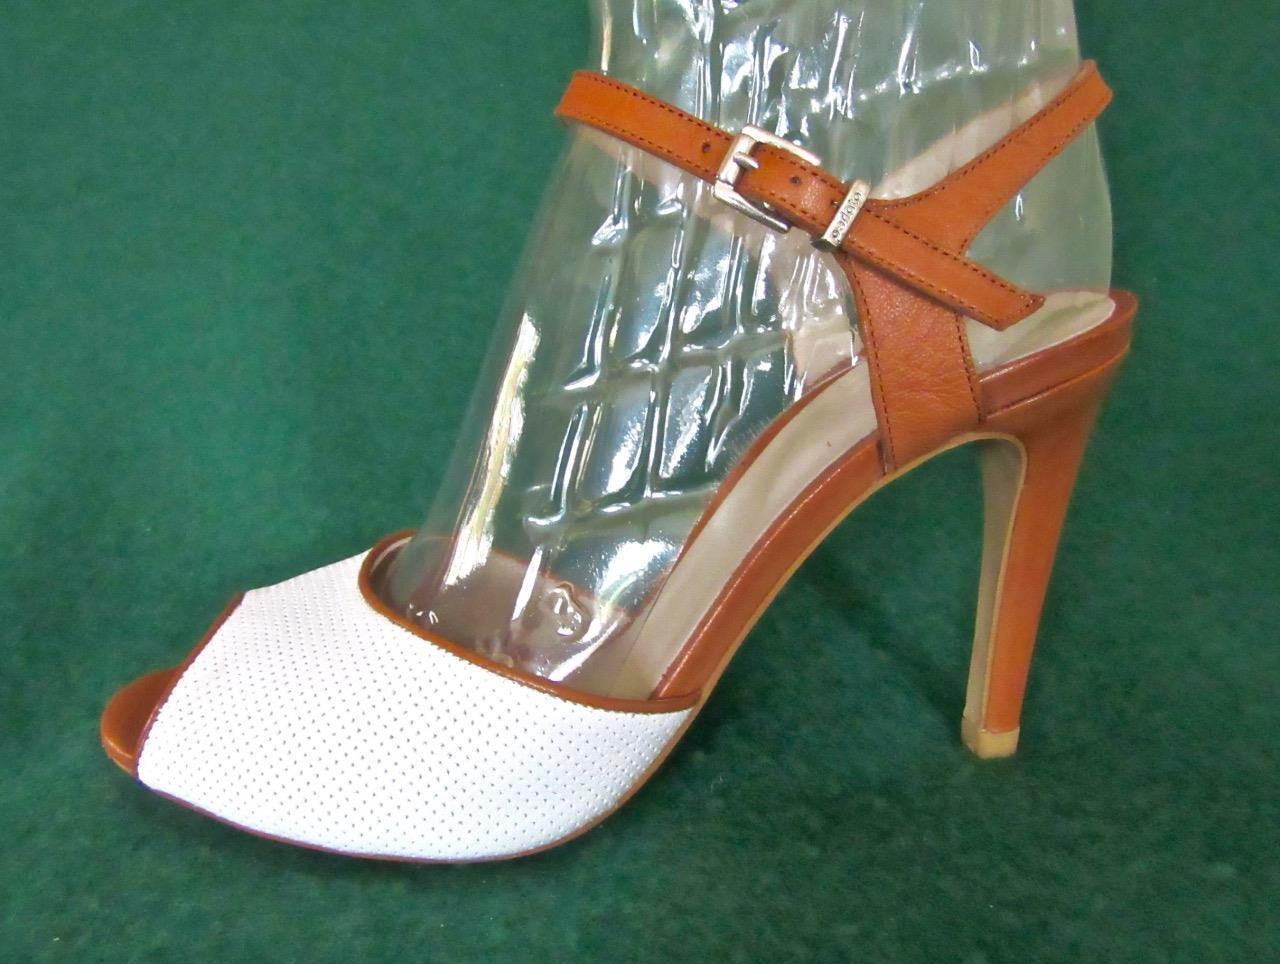 Nuevo Perlato Reino Unido 7 EUR blancoo 40 blancoo EUR y Marrón Tostado Cuero Slingback Zapatos Sandalias De Fiesta c1164e